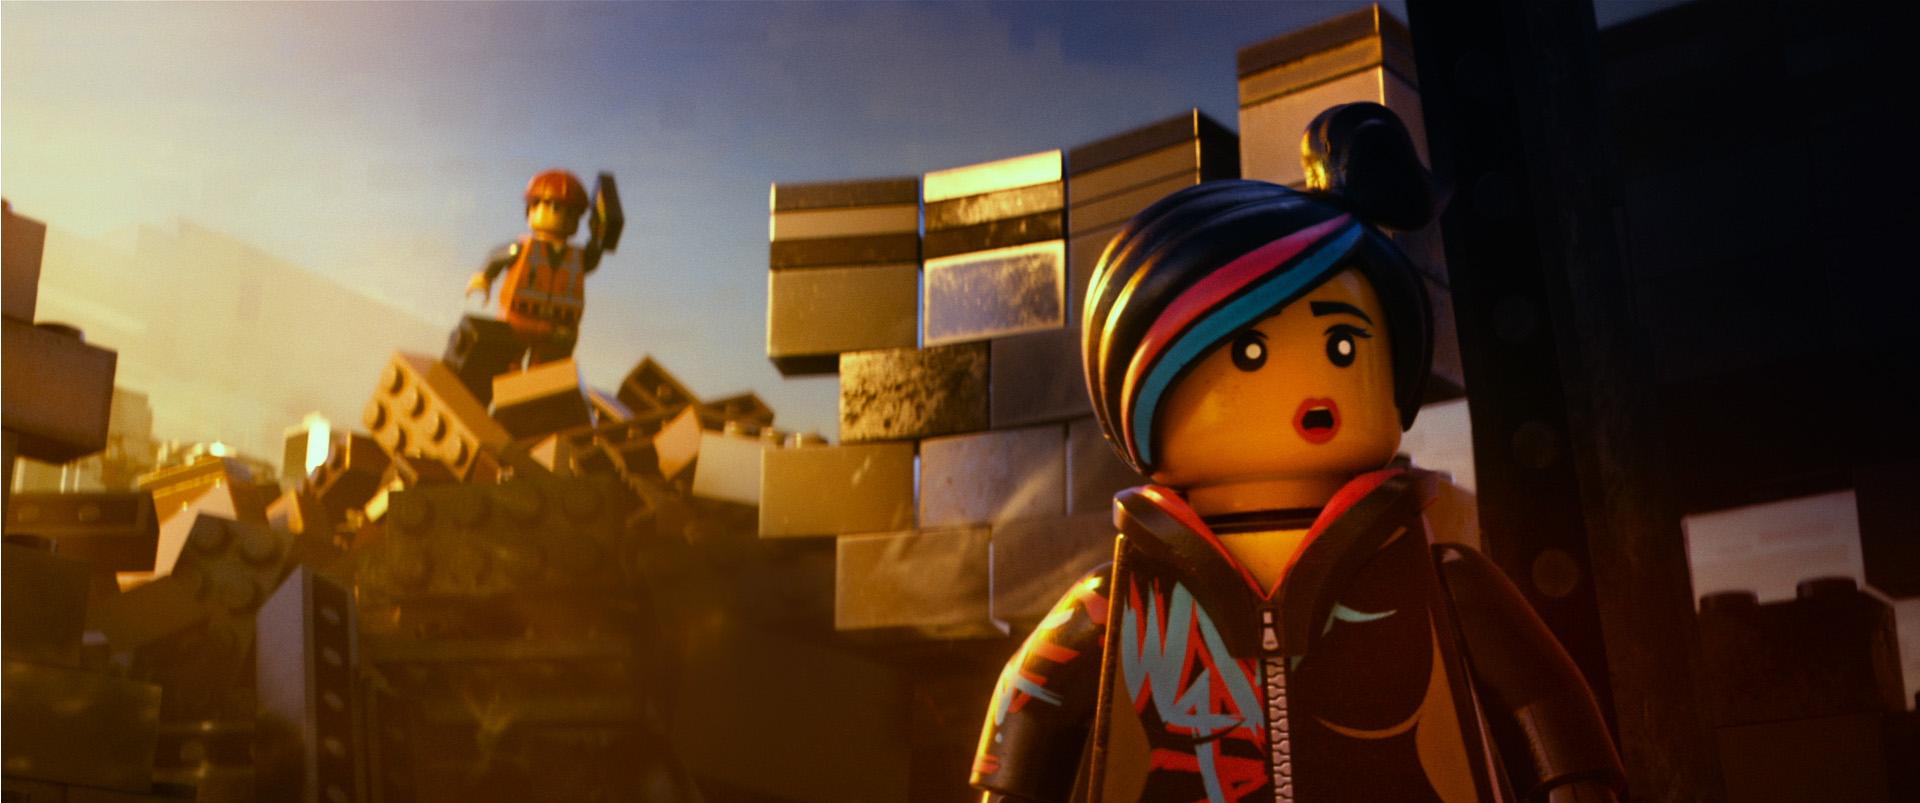 LEGO_jelenetfoto.jpg